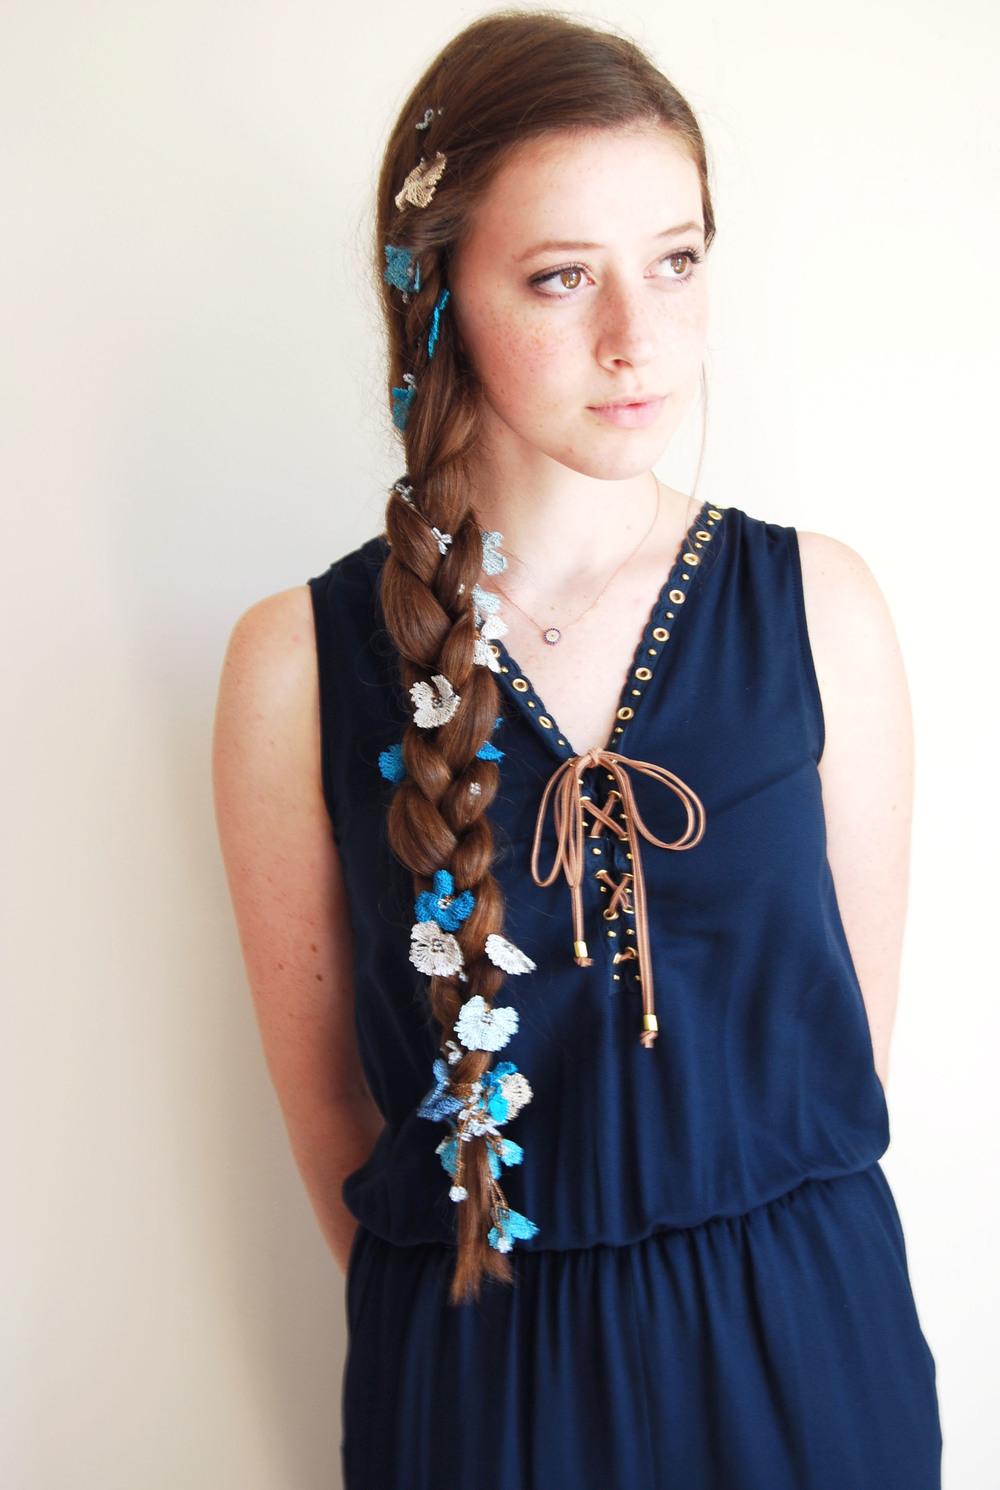 Hair braid tutorial // OYA lace creative wrap $48 // Navy Jumper $98 // Evil Eye necklace $48